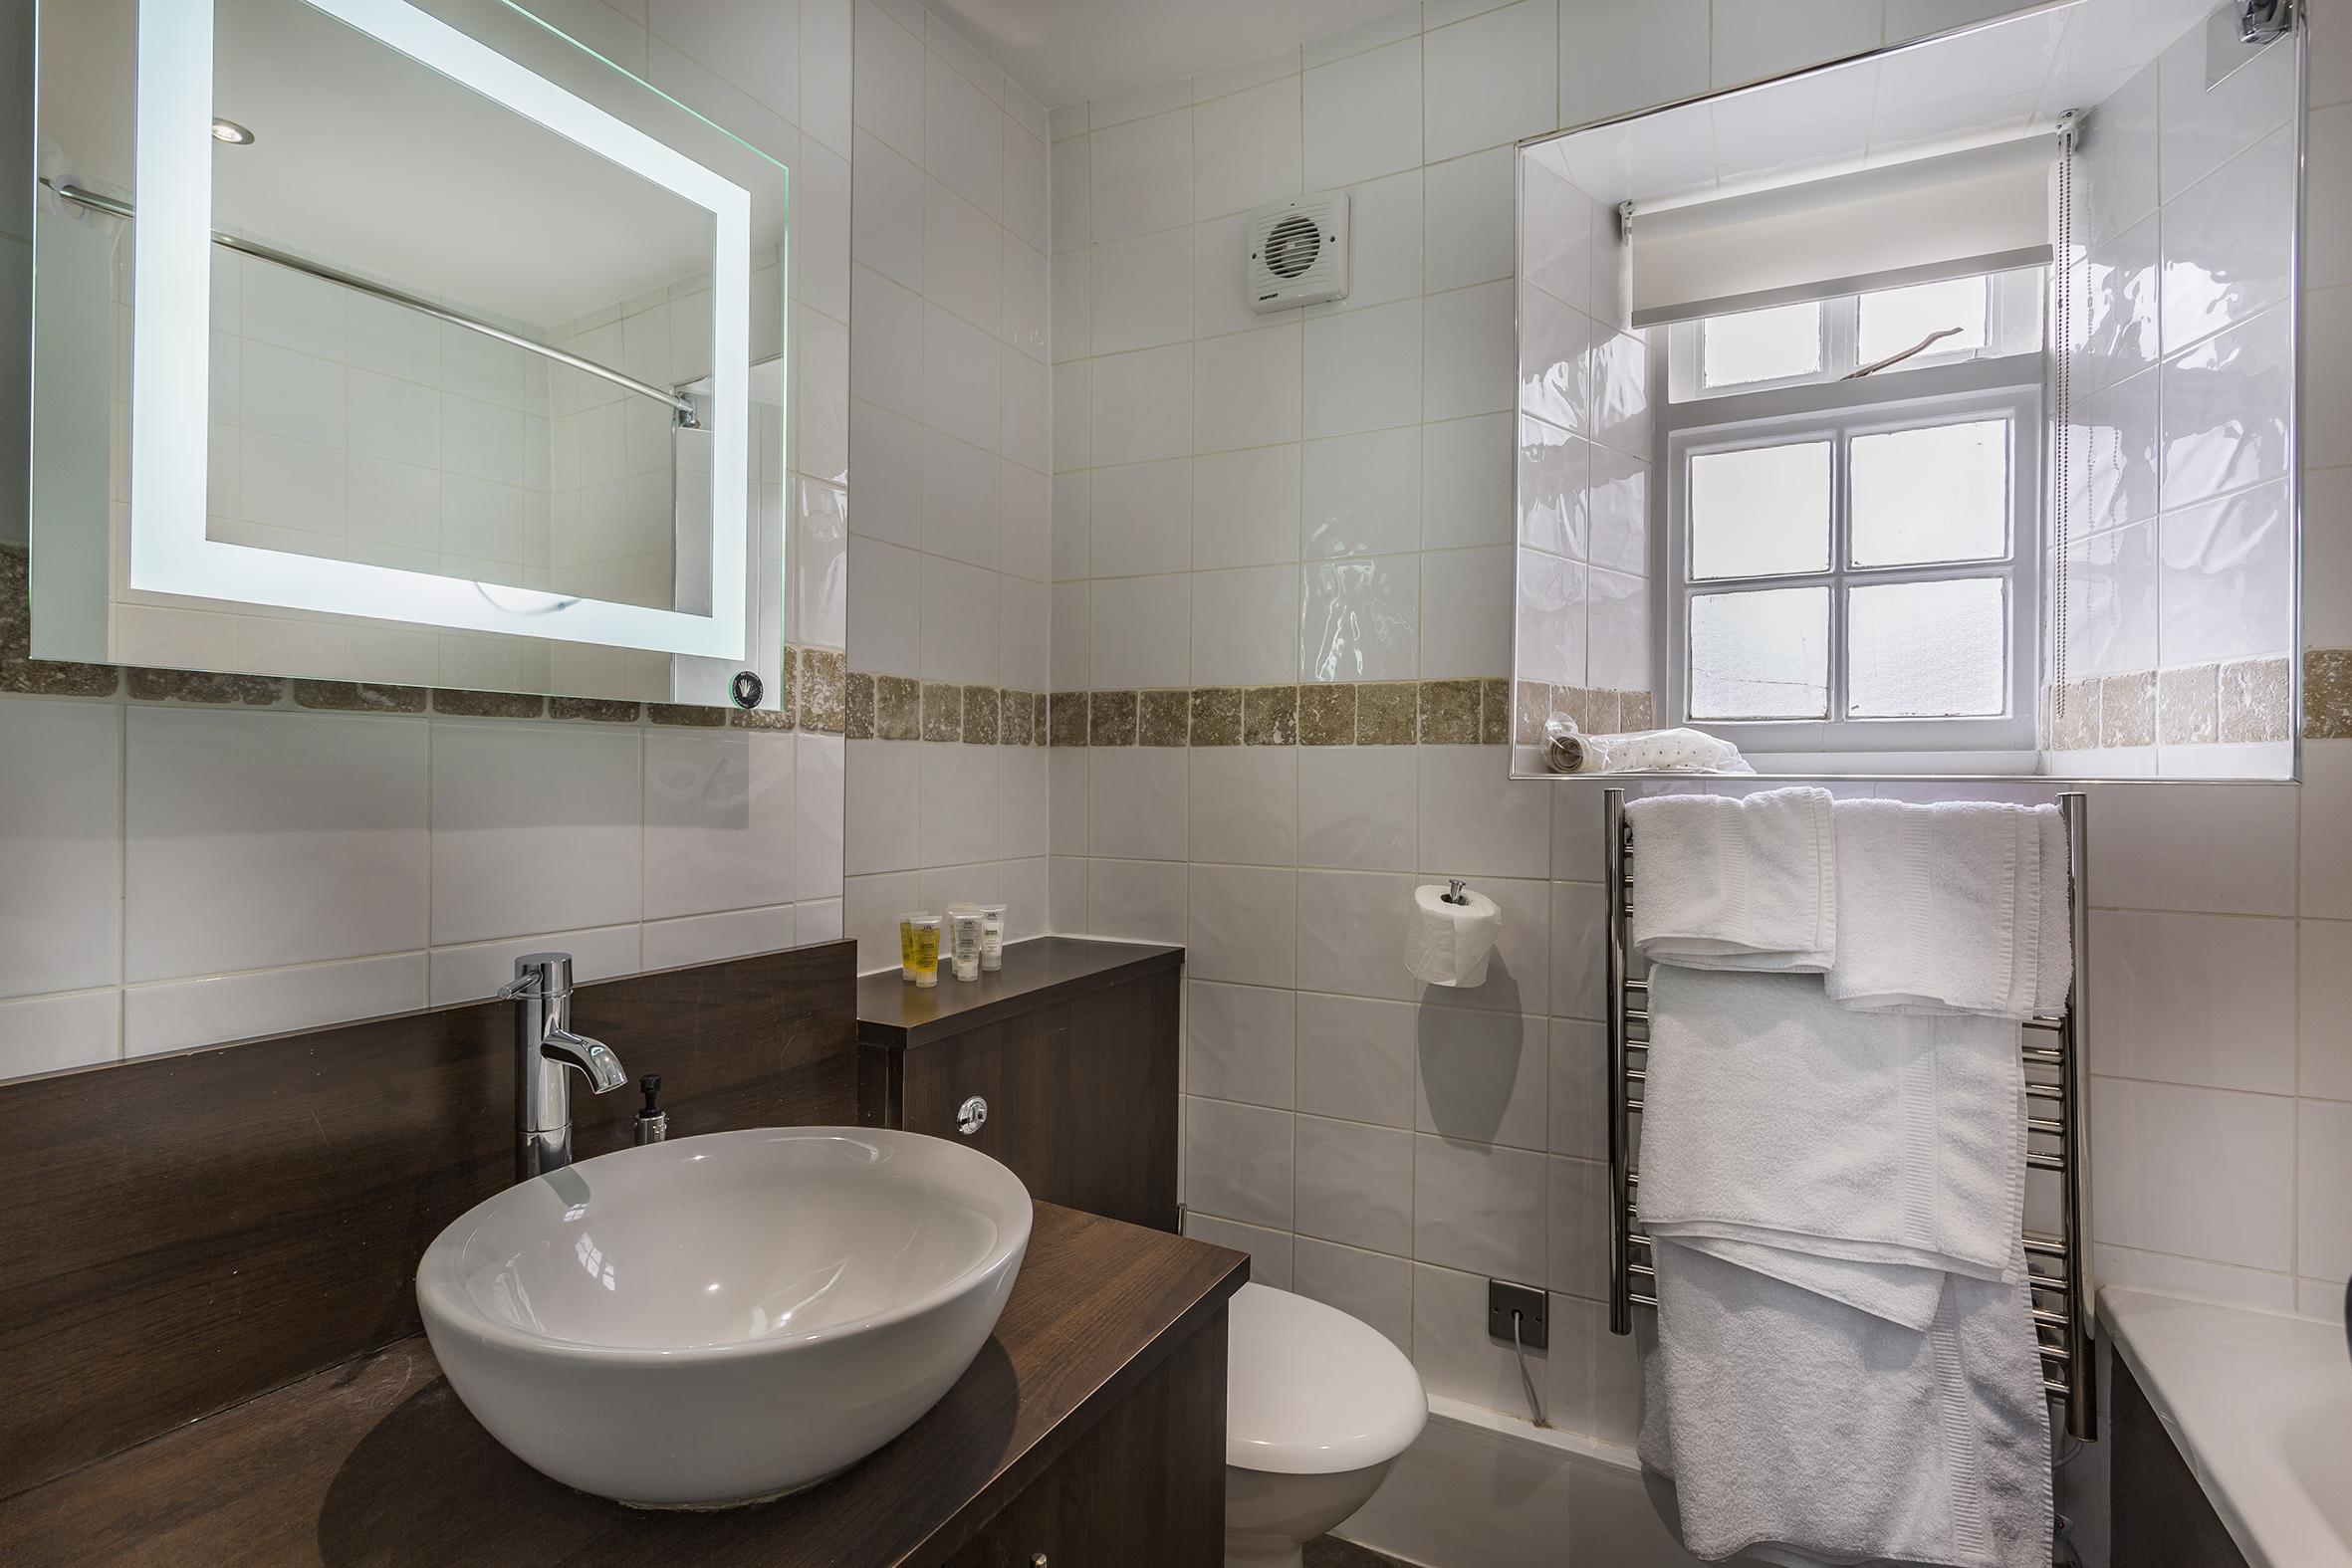 WhiteHartRoyal_Room_114_Bathroom2.jpg